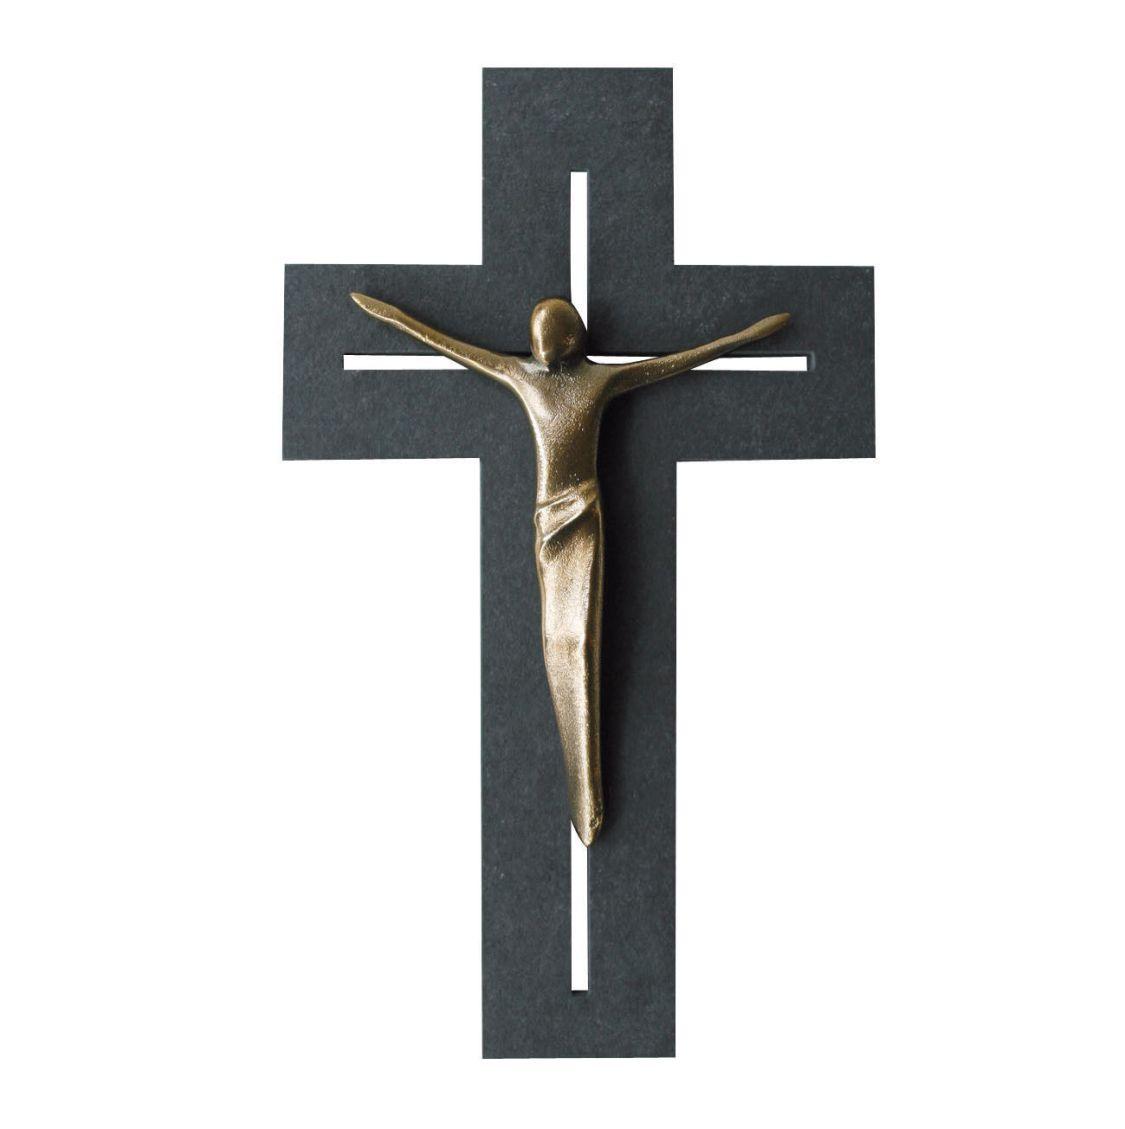 Wandkreuz Schiefer Korpus Jesus Bronze Kreuz 22 cm Kruzifix Christlich